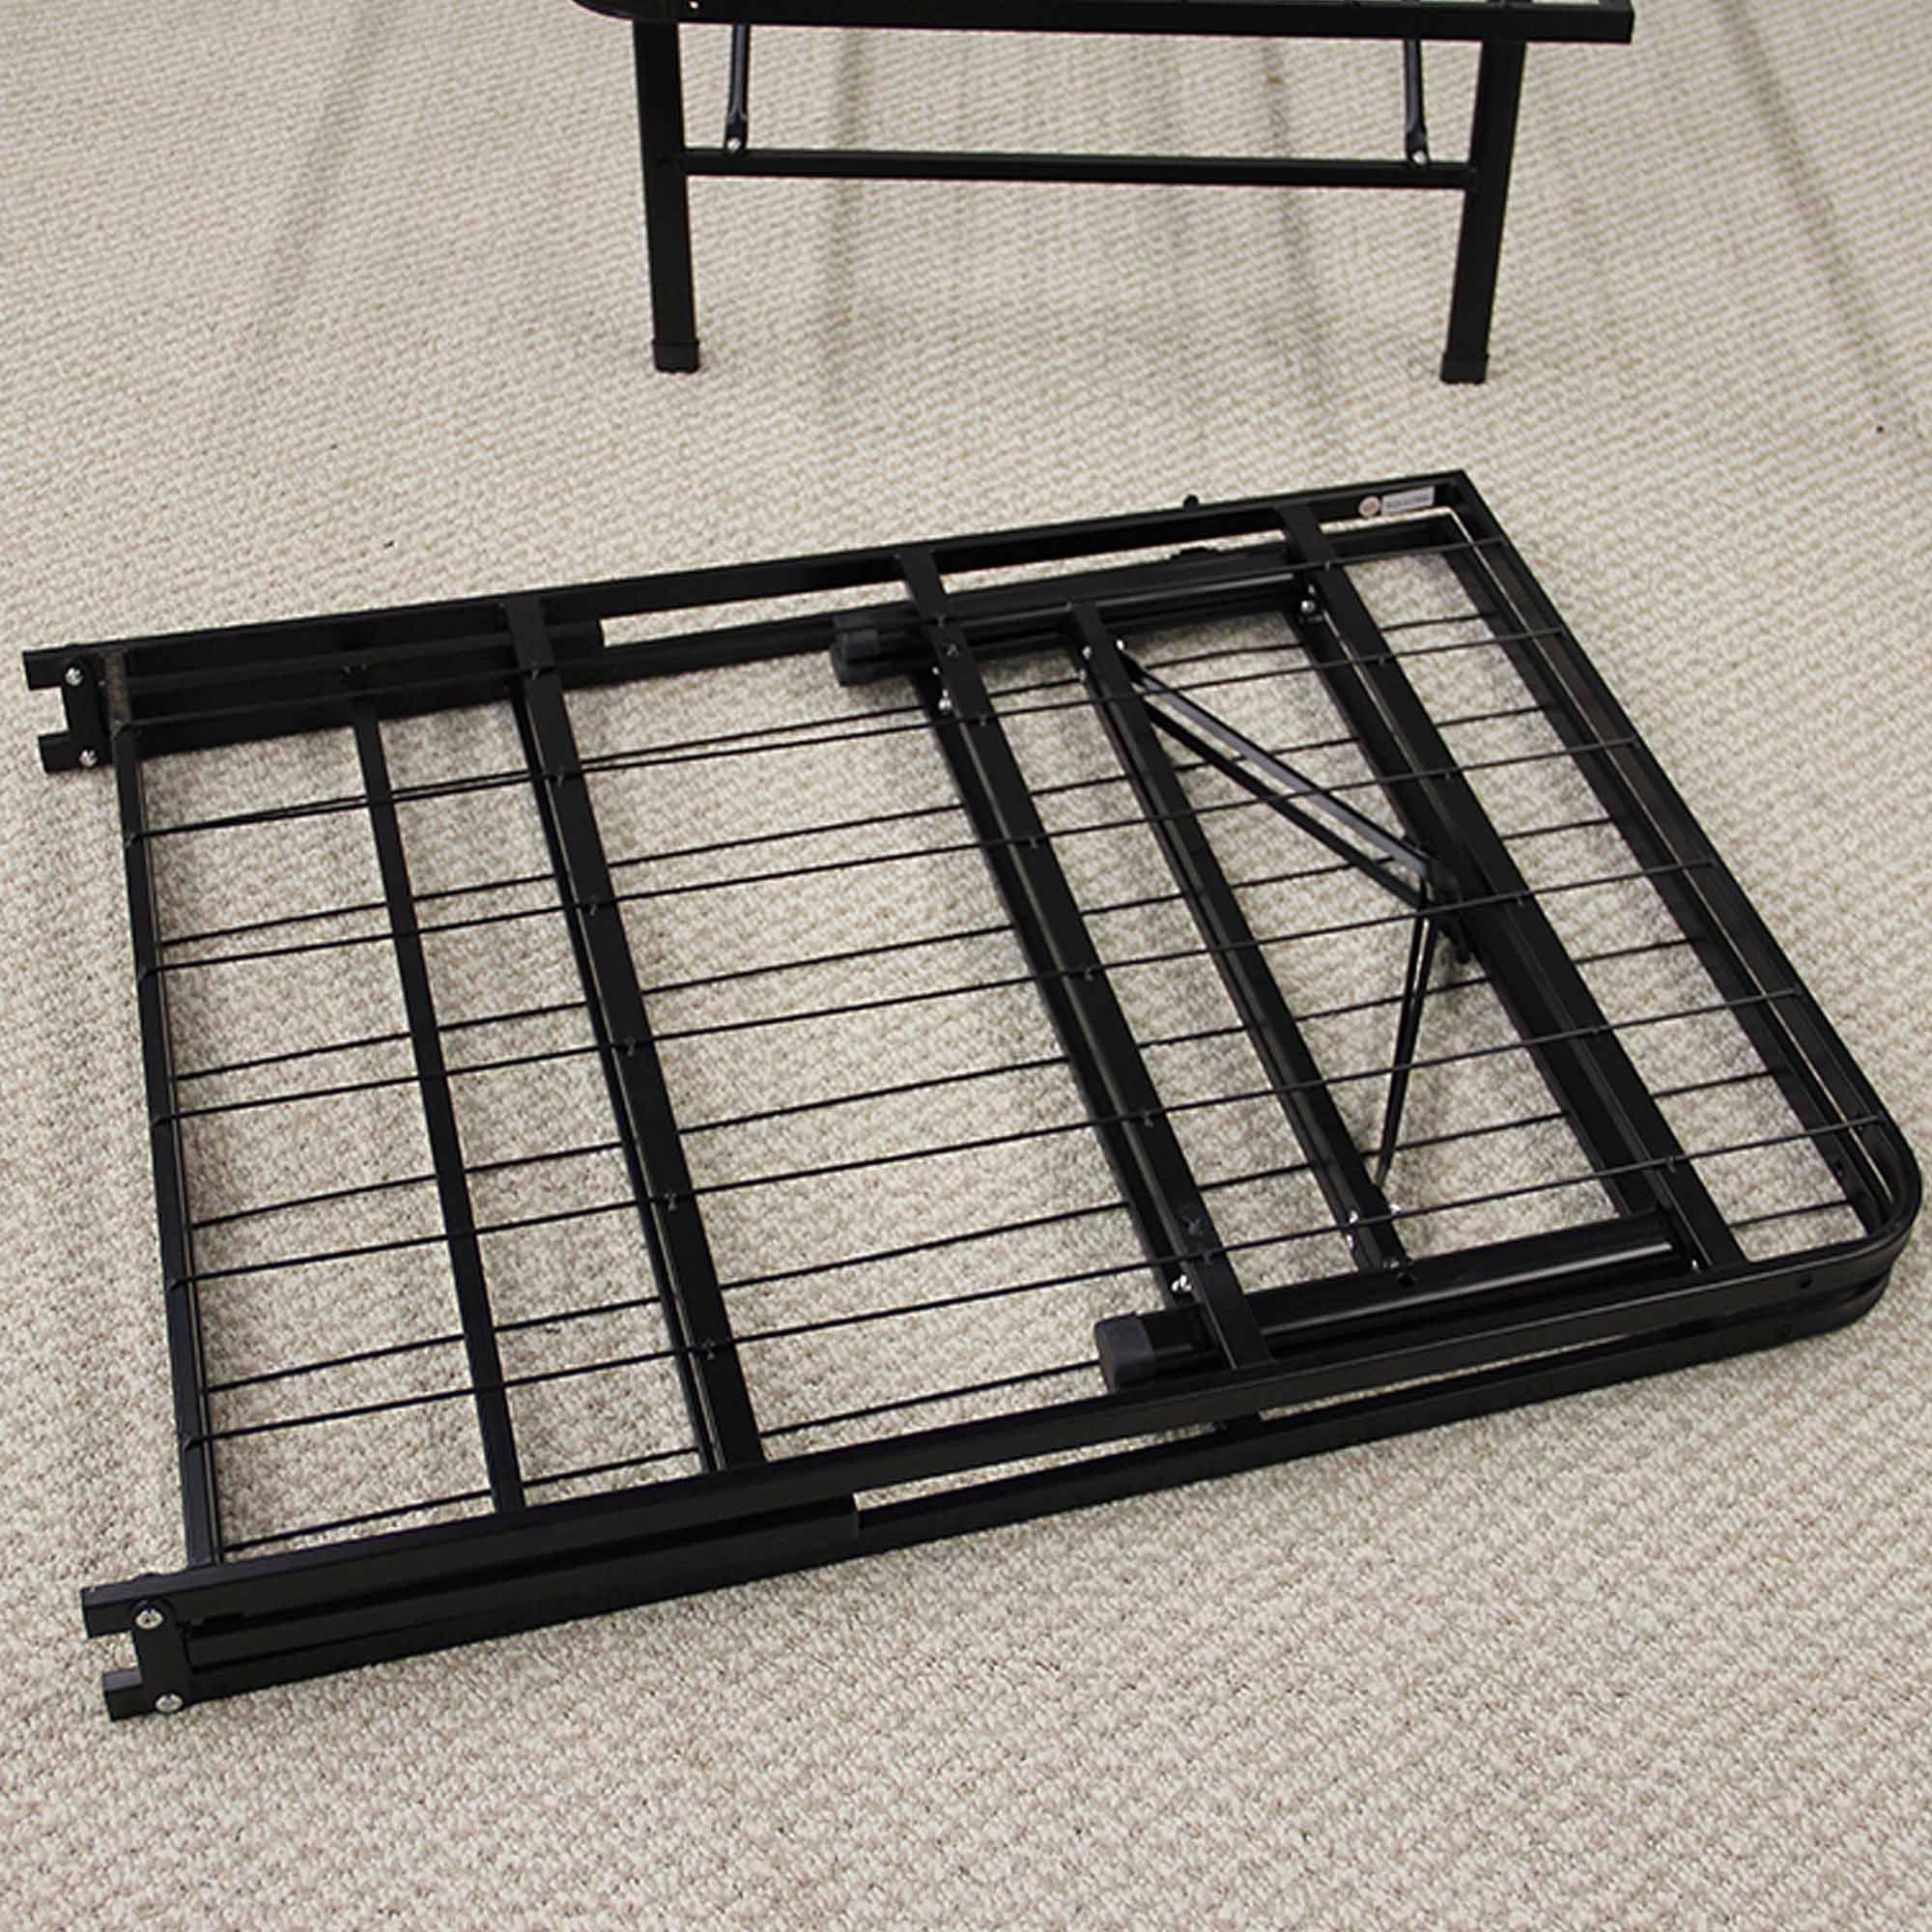 modern sleep platform metal bed frame mattress foundation walmartcom - Metal Bed Frame Full